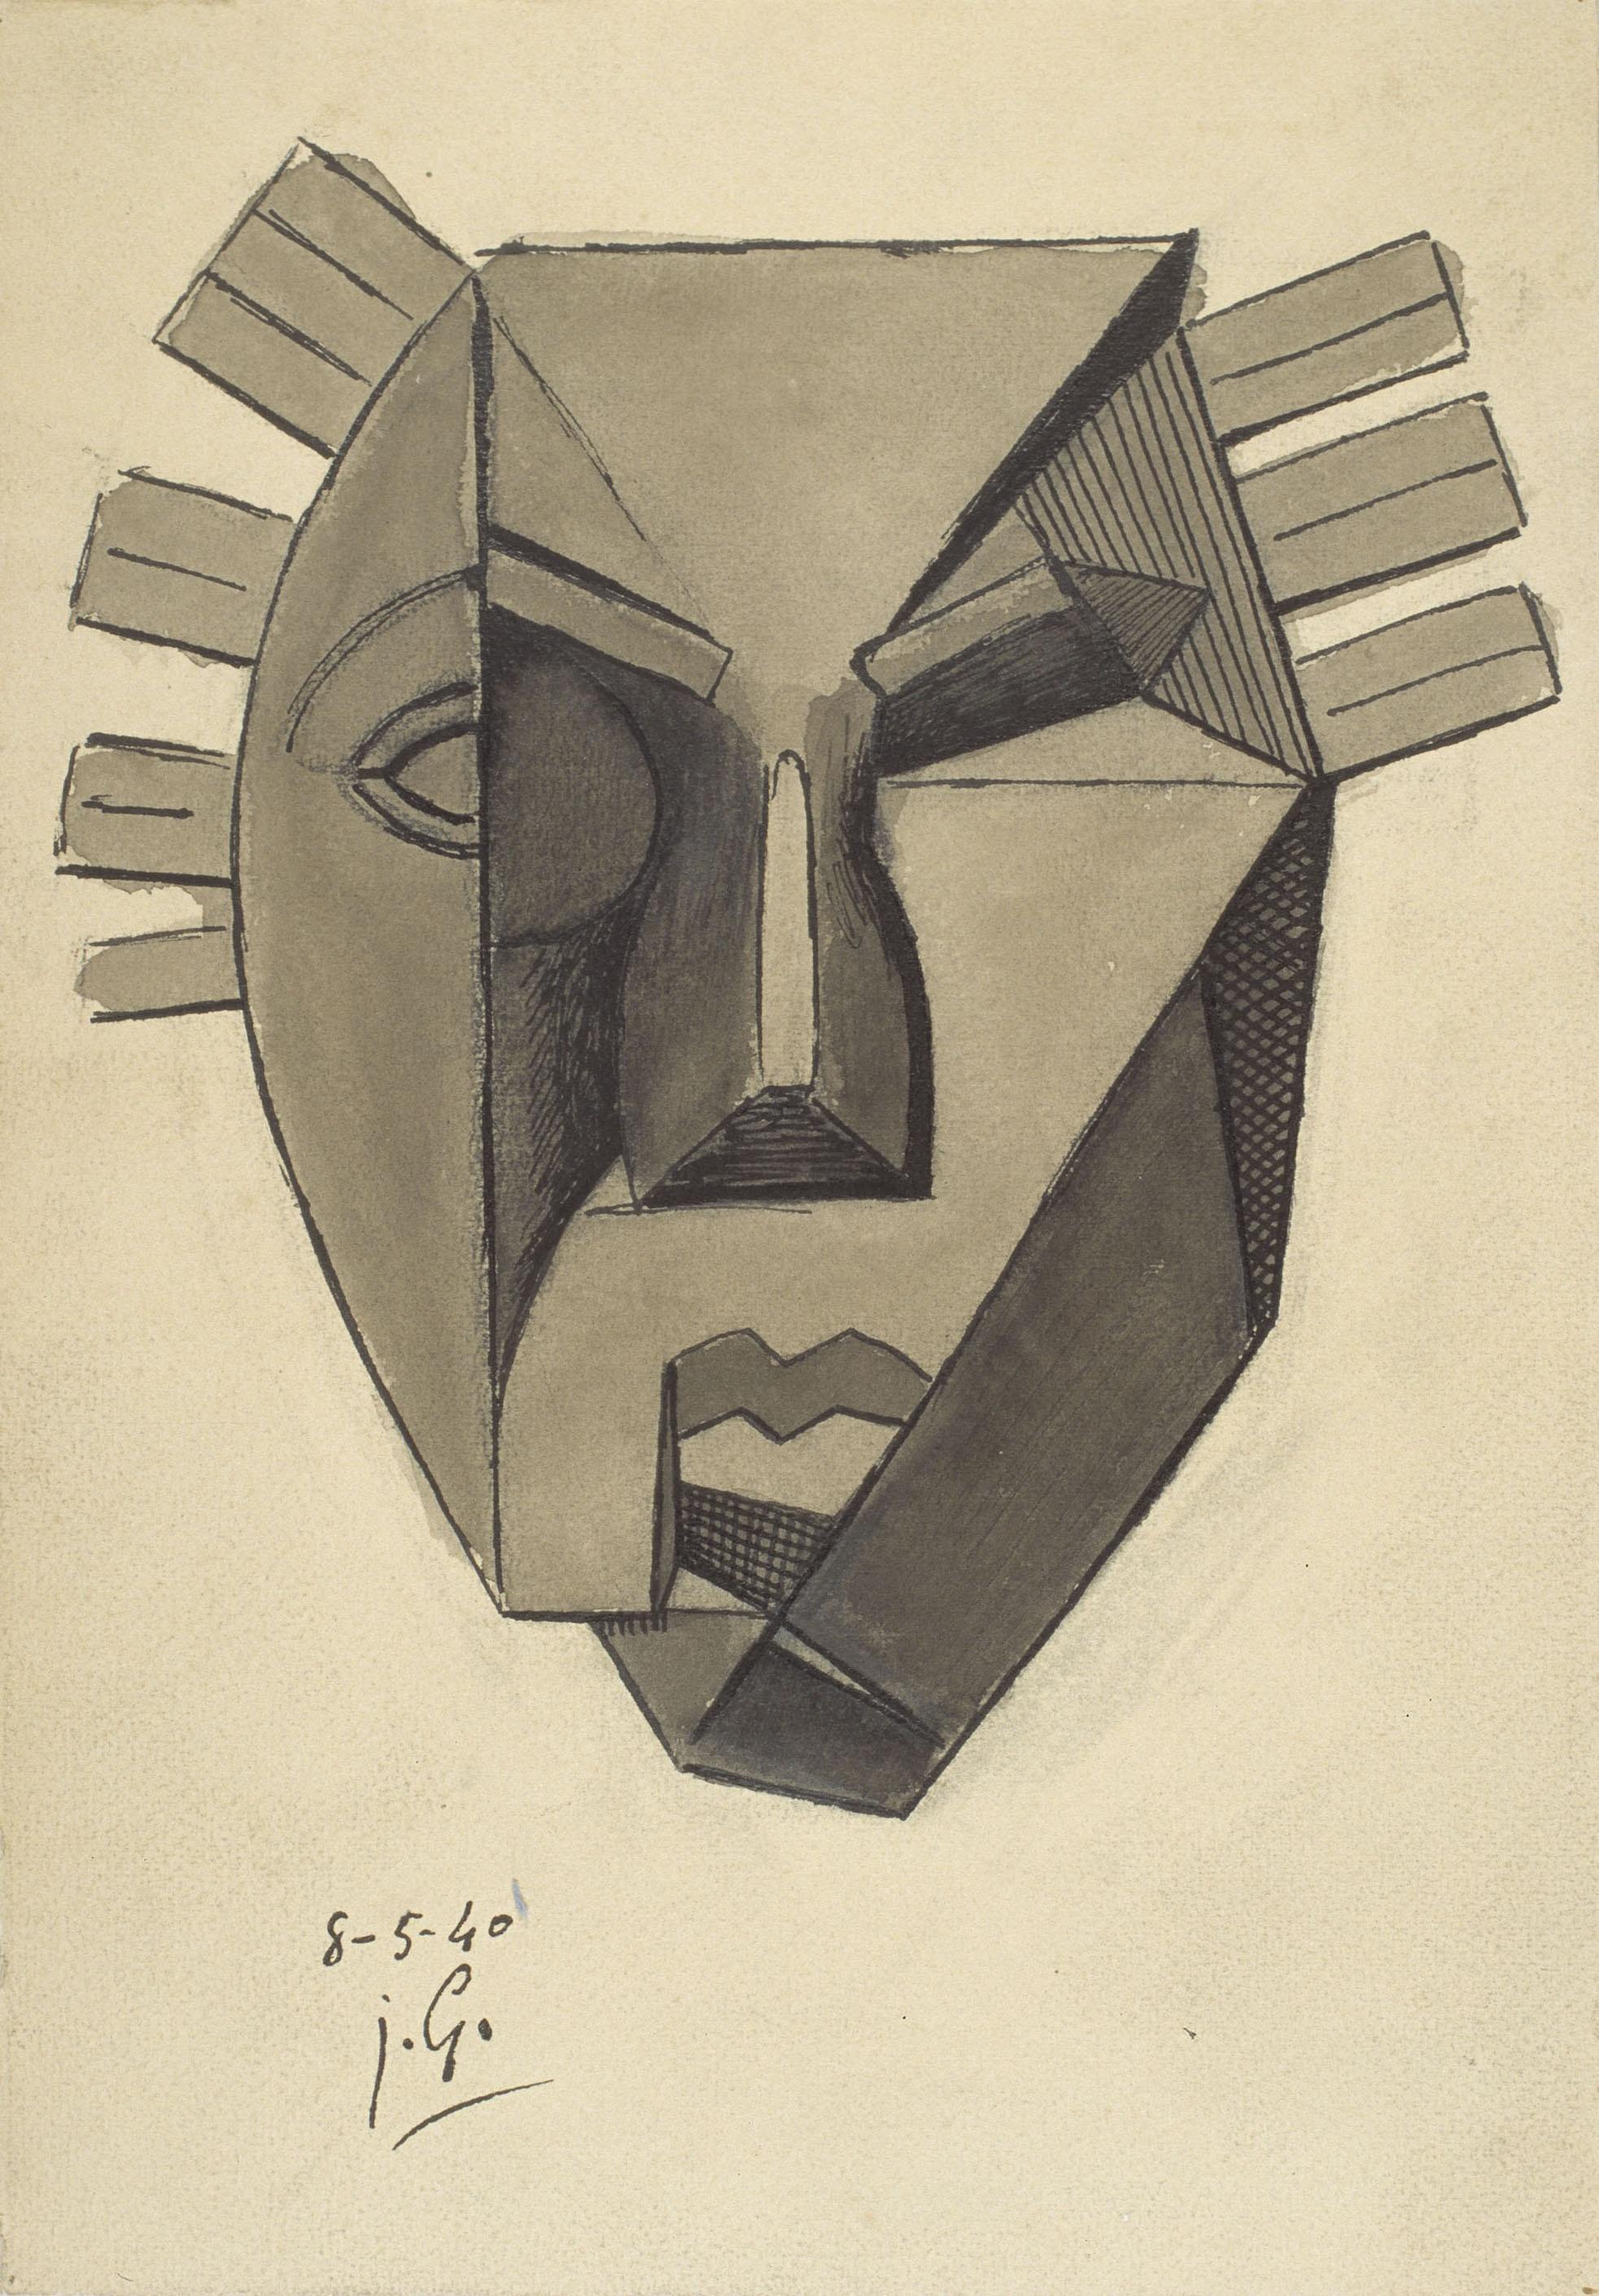 Juli González - Màscara austera (Masque rigoreux) - 1940